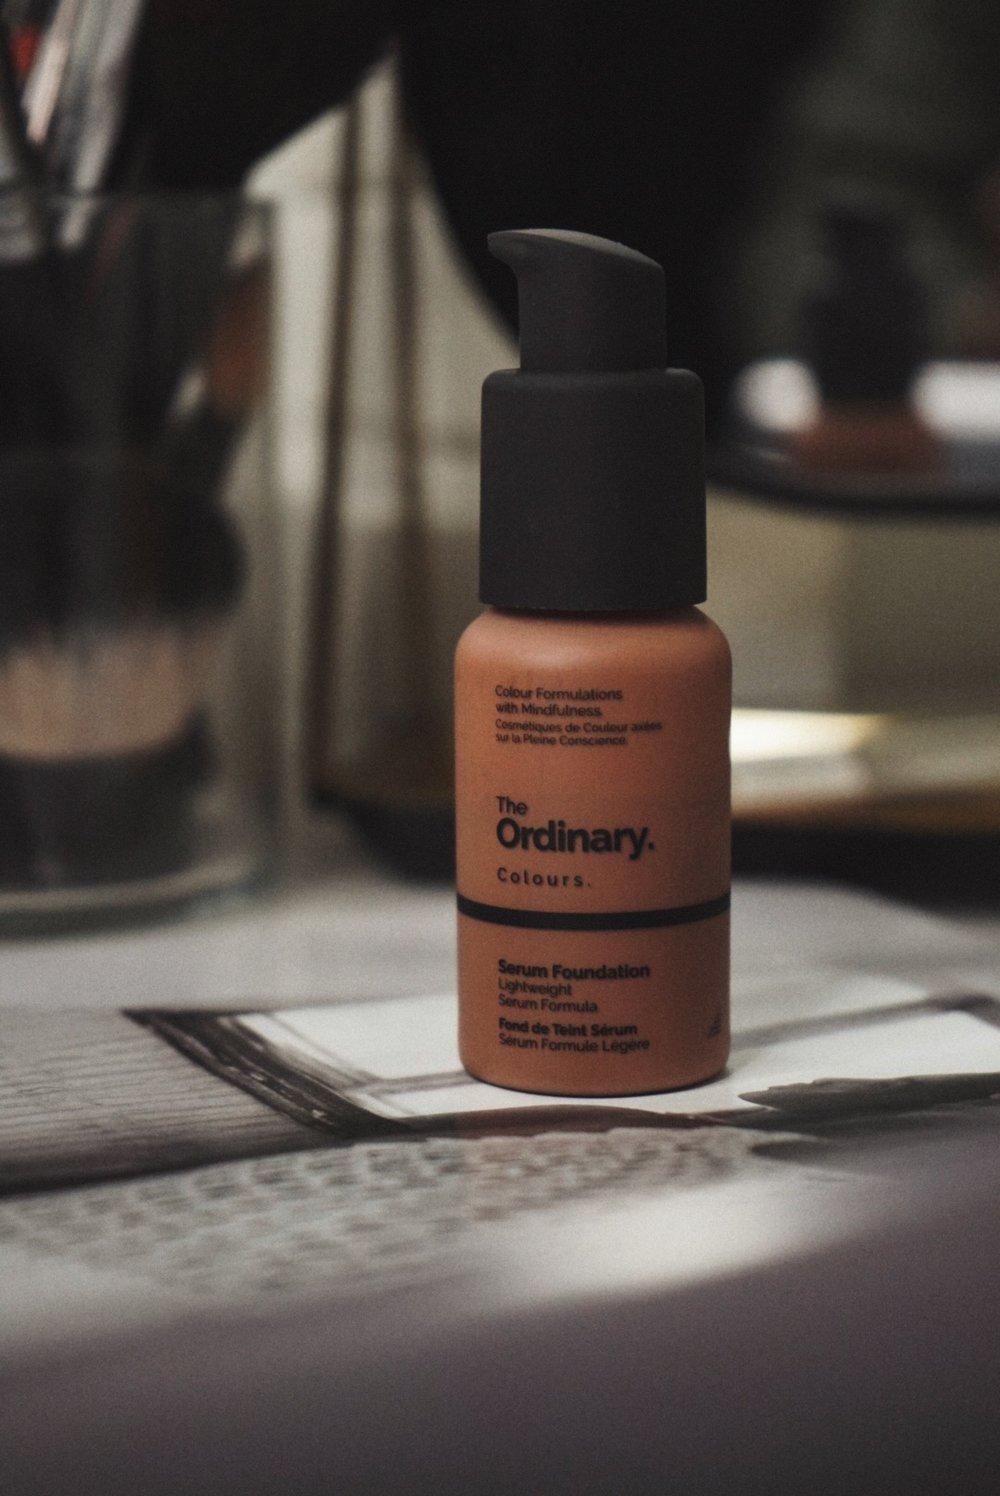 TashaJames-TheGlossier-Top-Foundations-Makeup-23.JPG